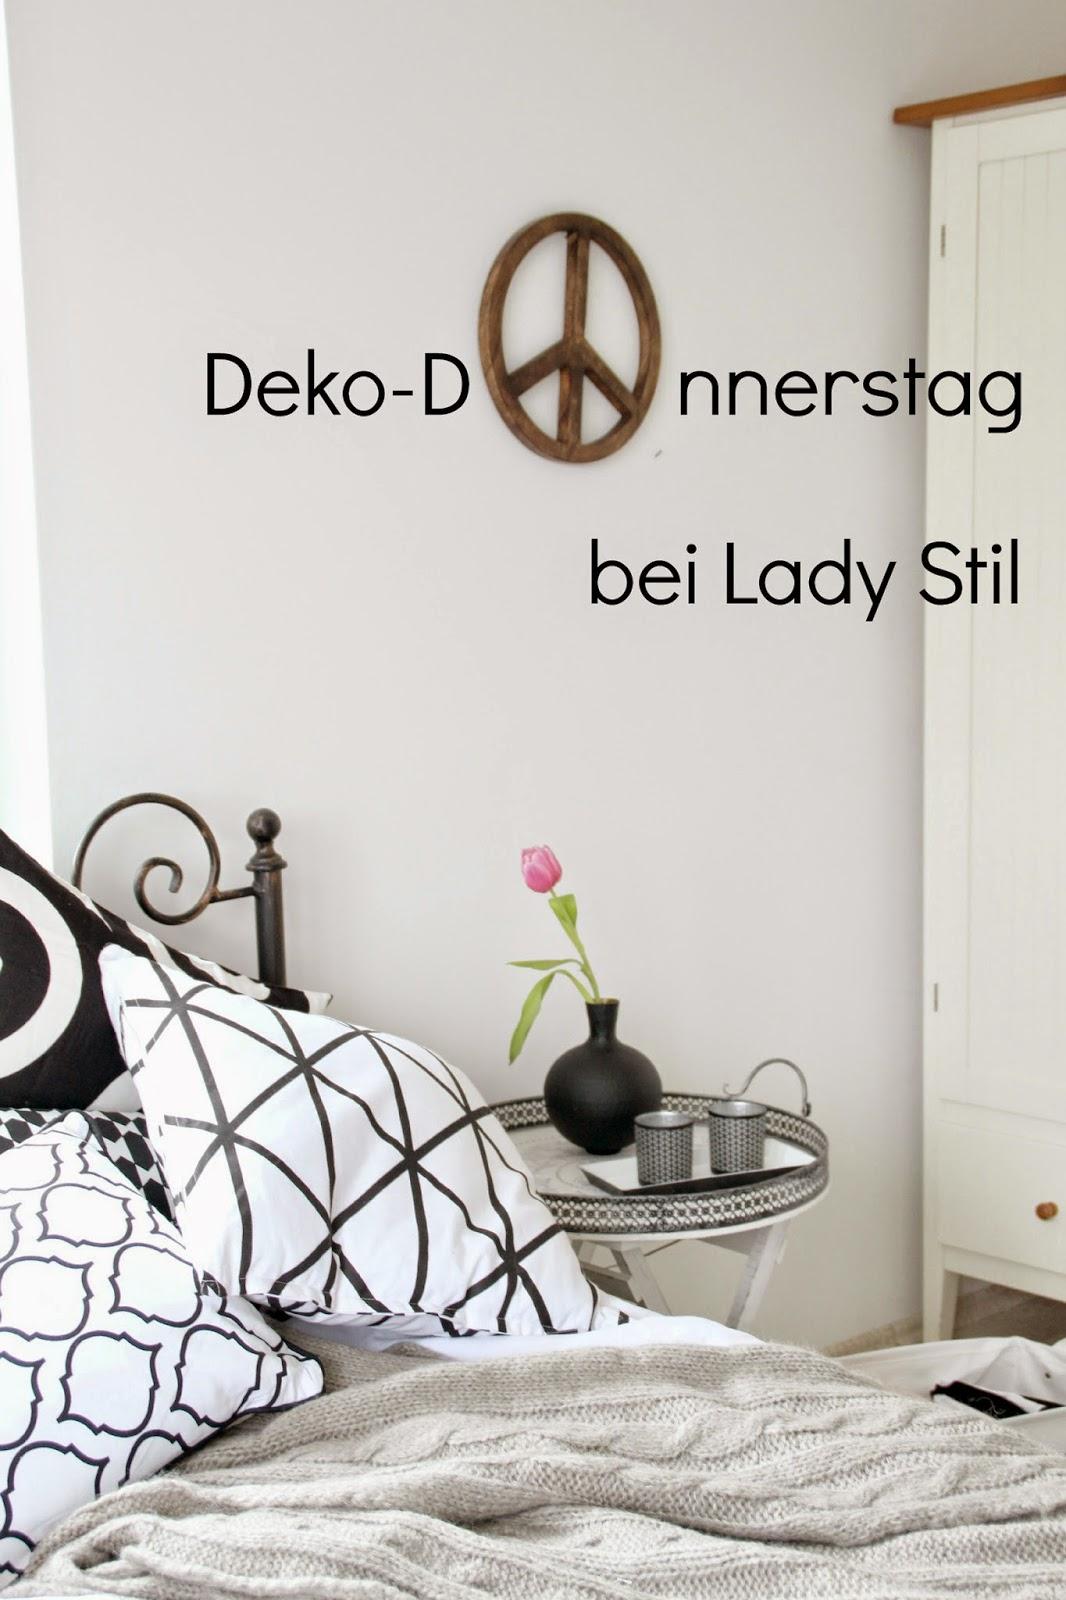 noch mehr Deko...